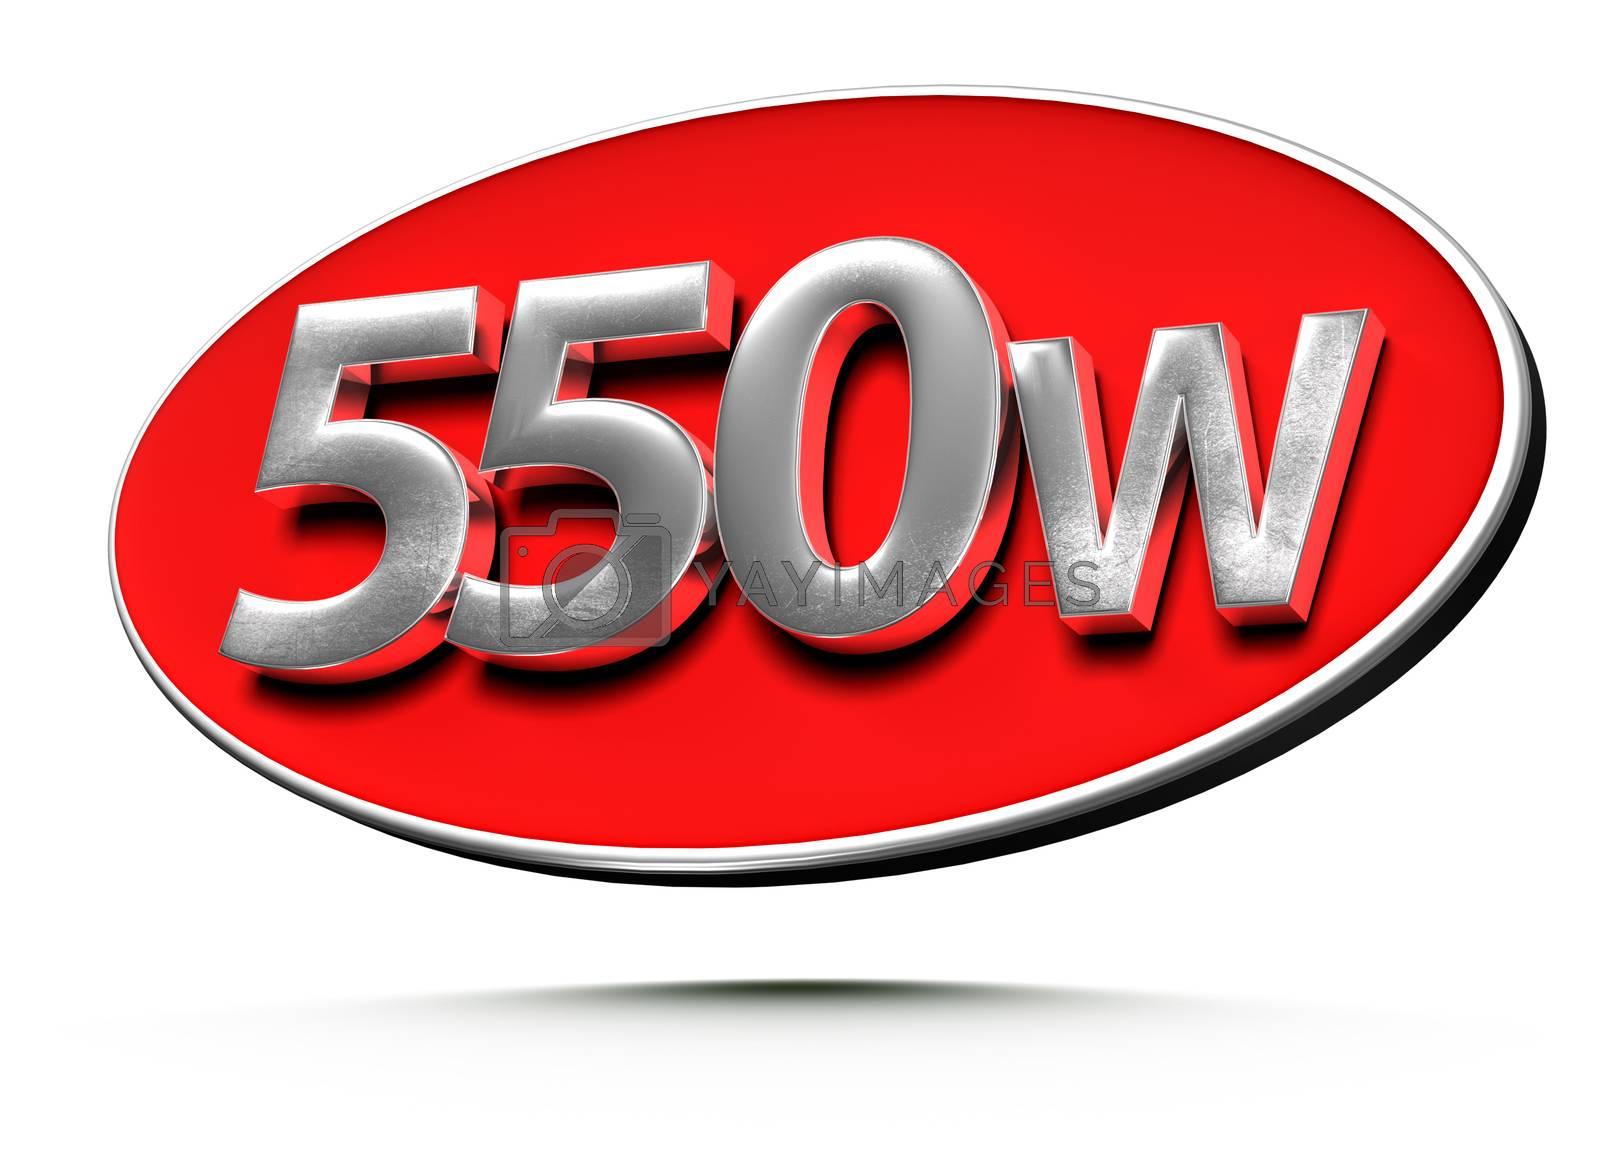 550w 3d. by thitimontoyai